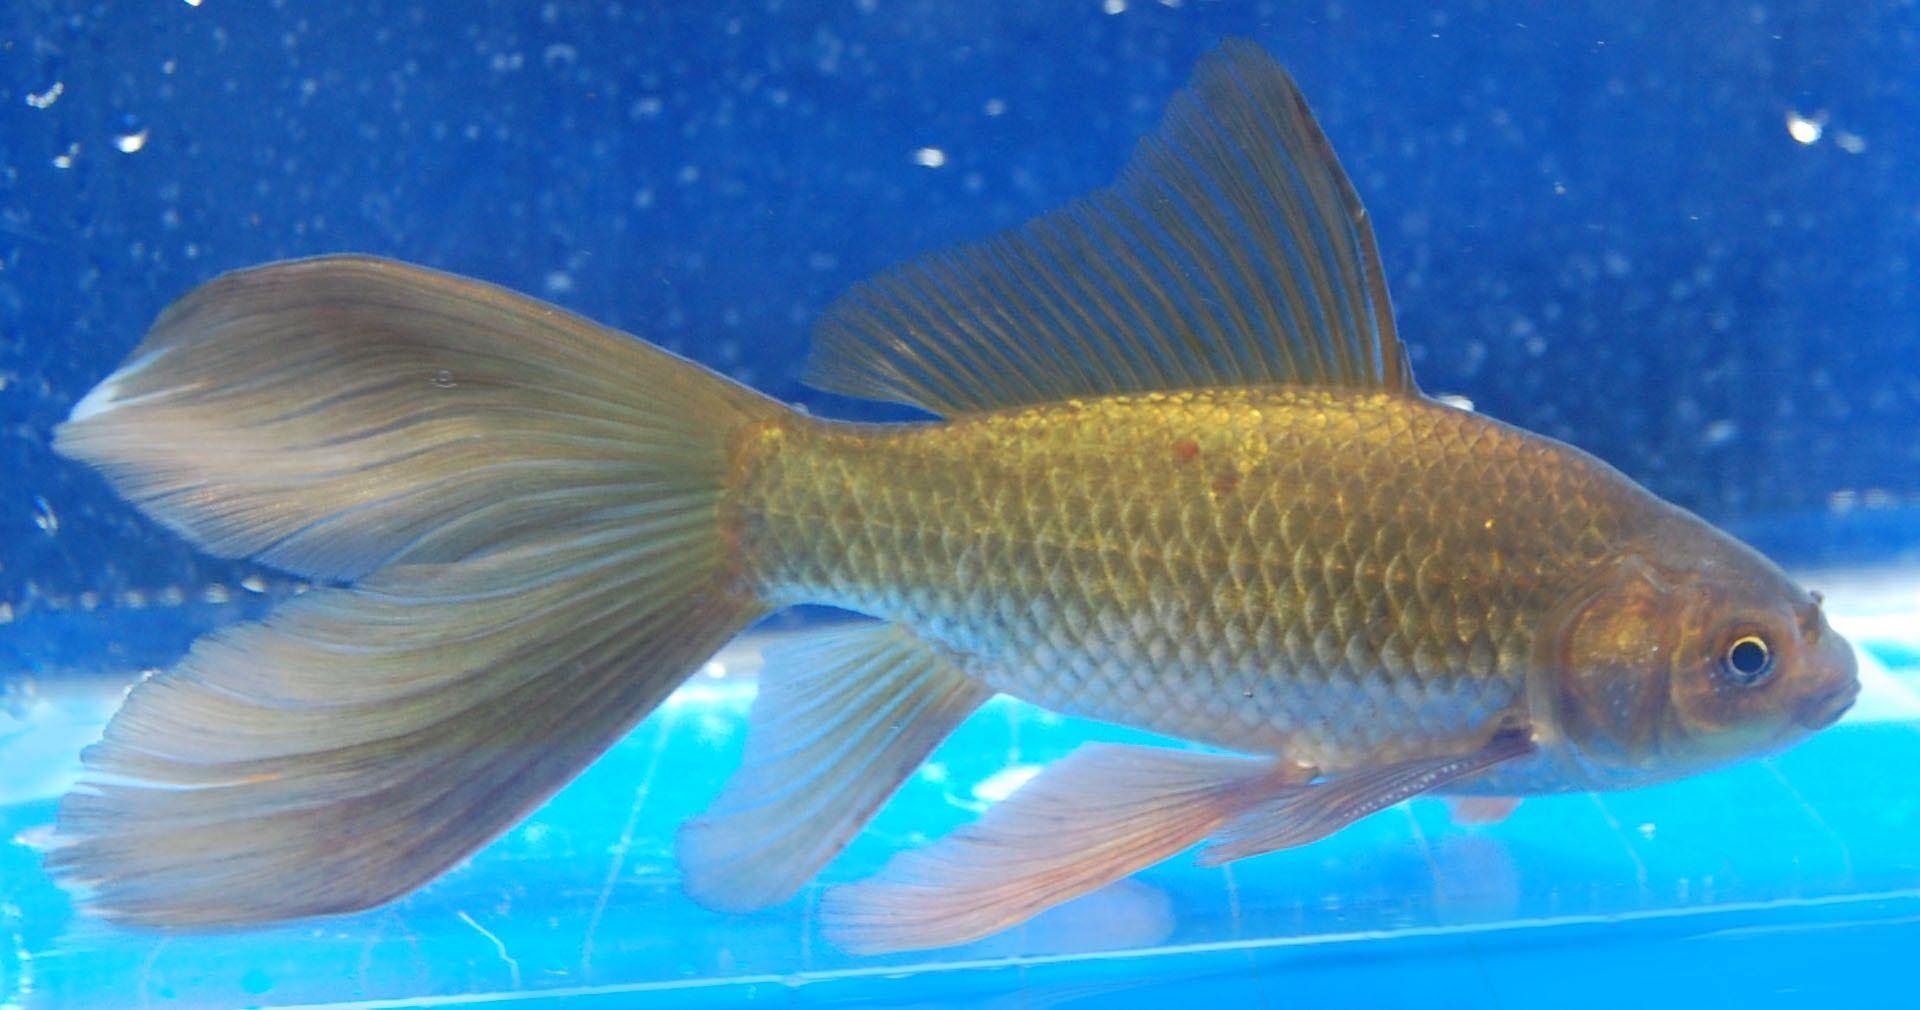 Goldfish Bristol Tailed Comet Comet Goldfish Goldfish Fish Pet